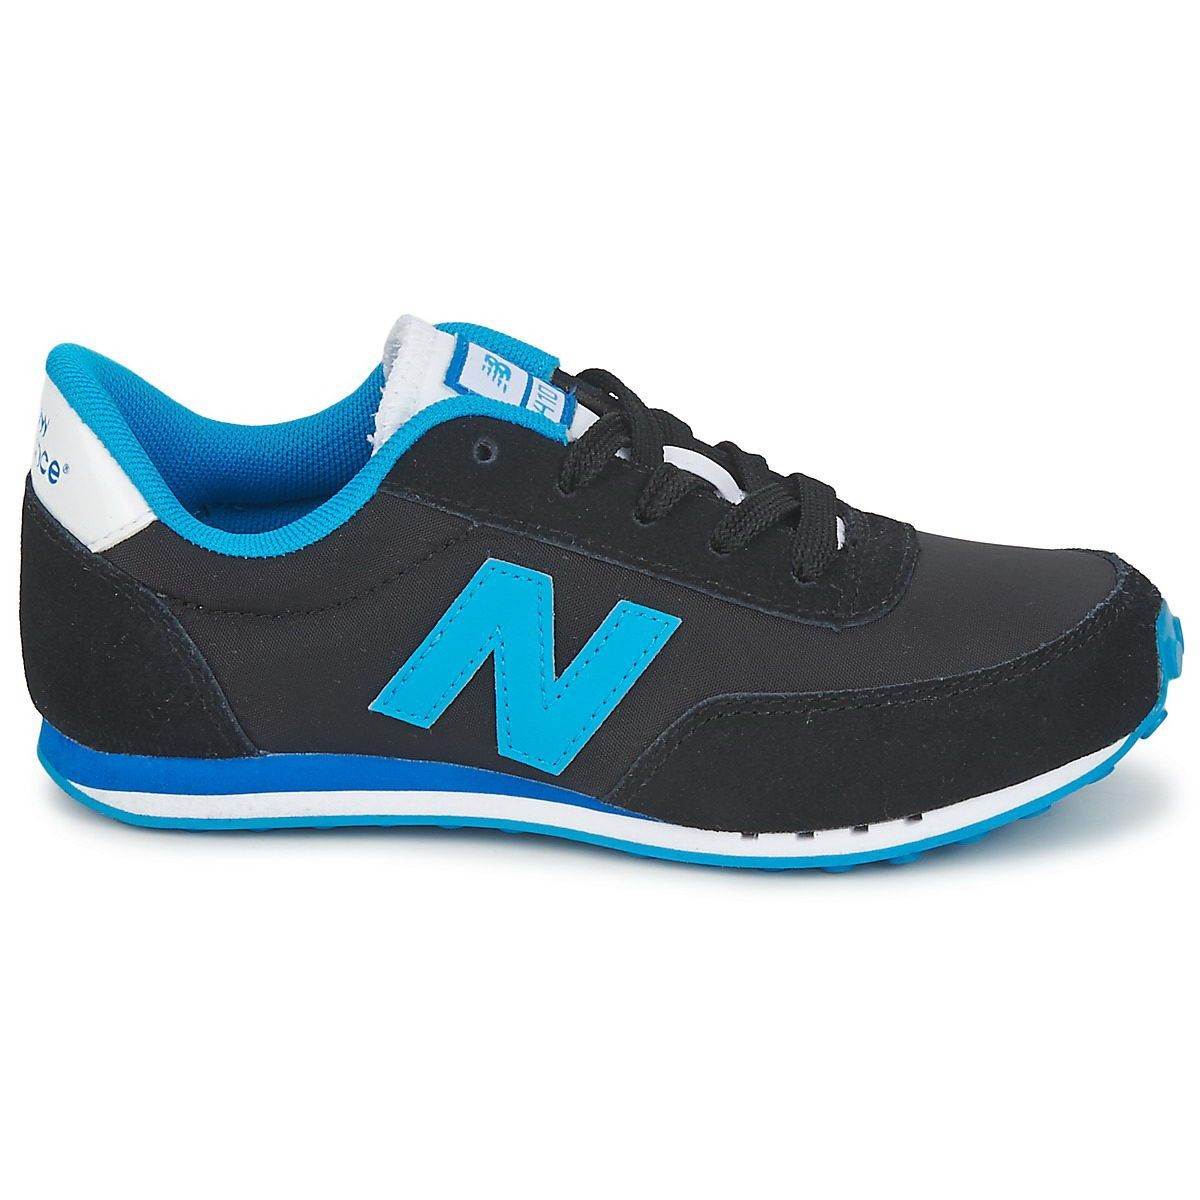 New balance shoes, New balance 410